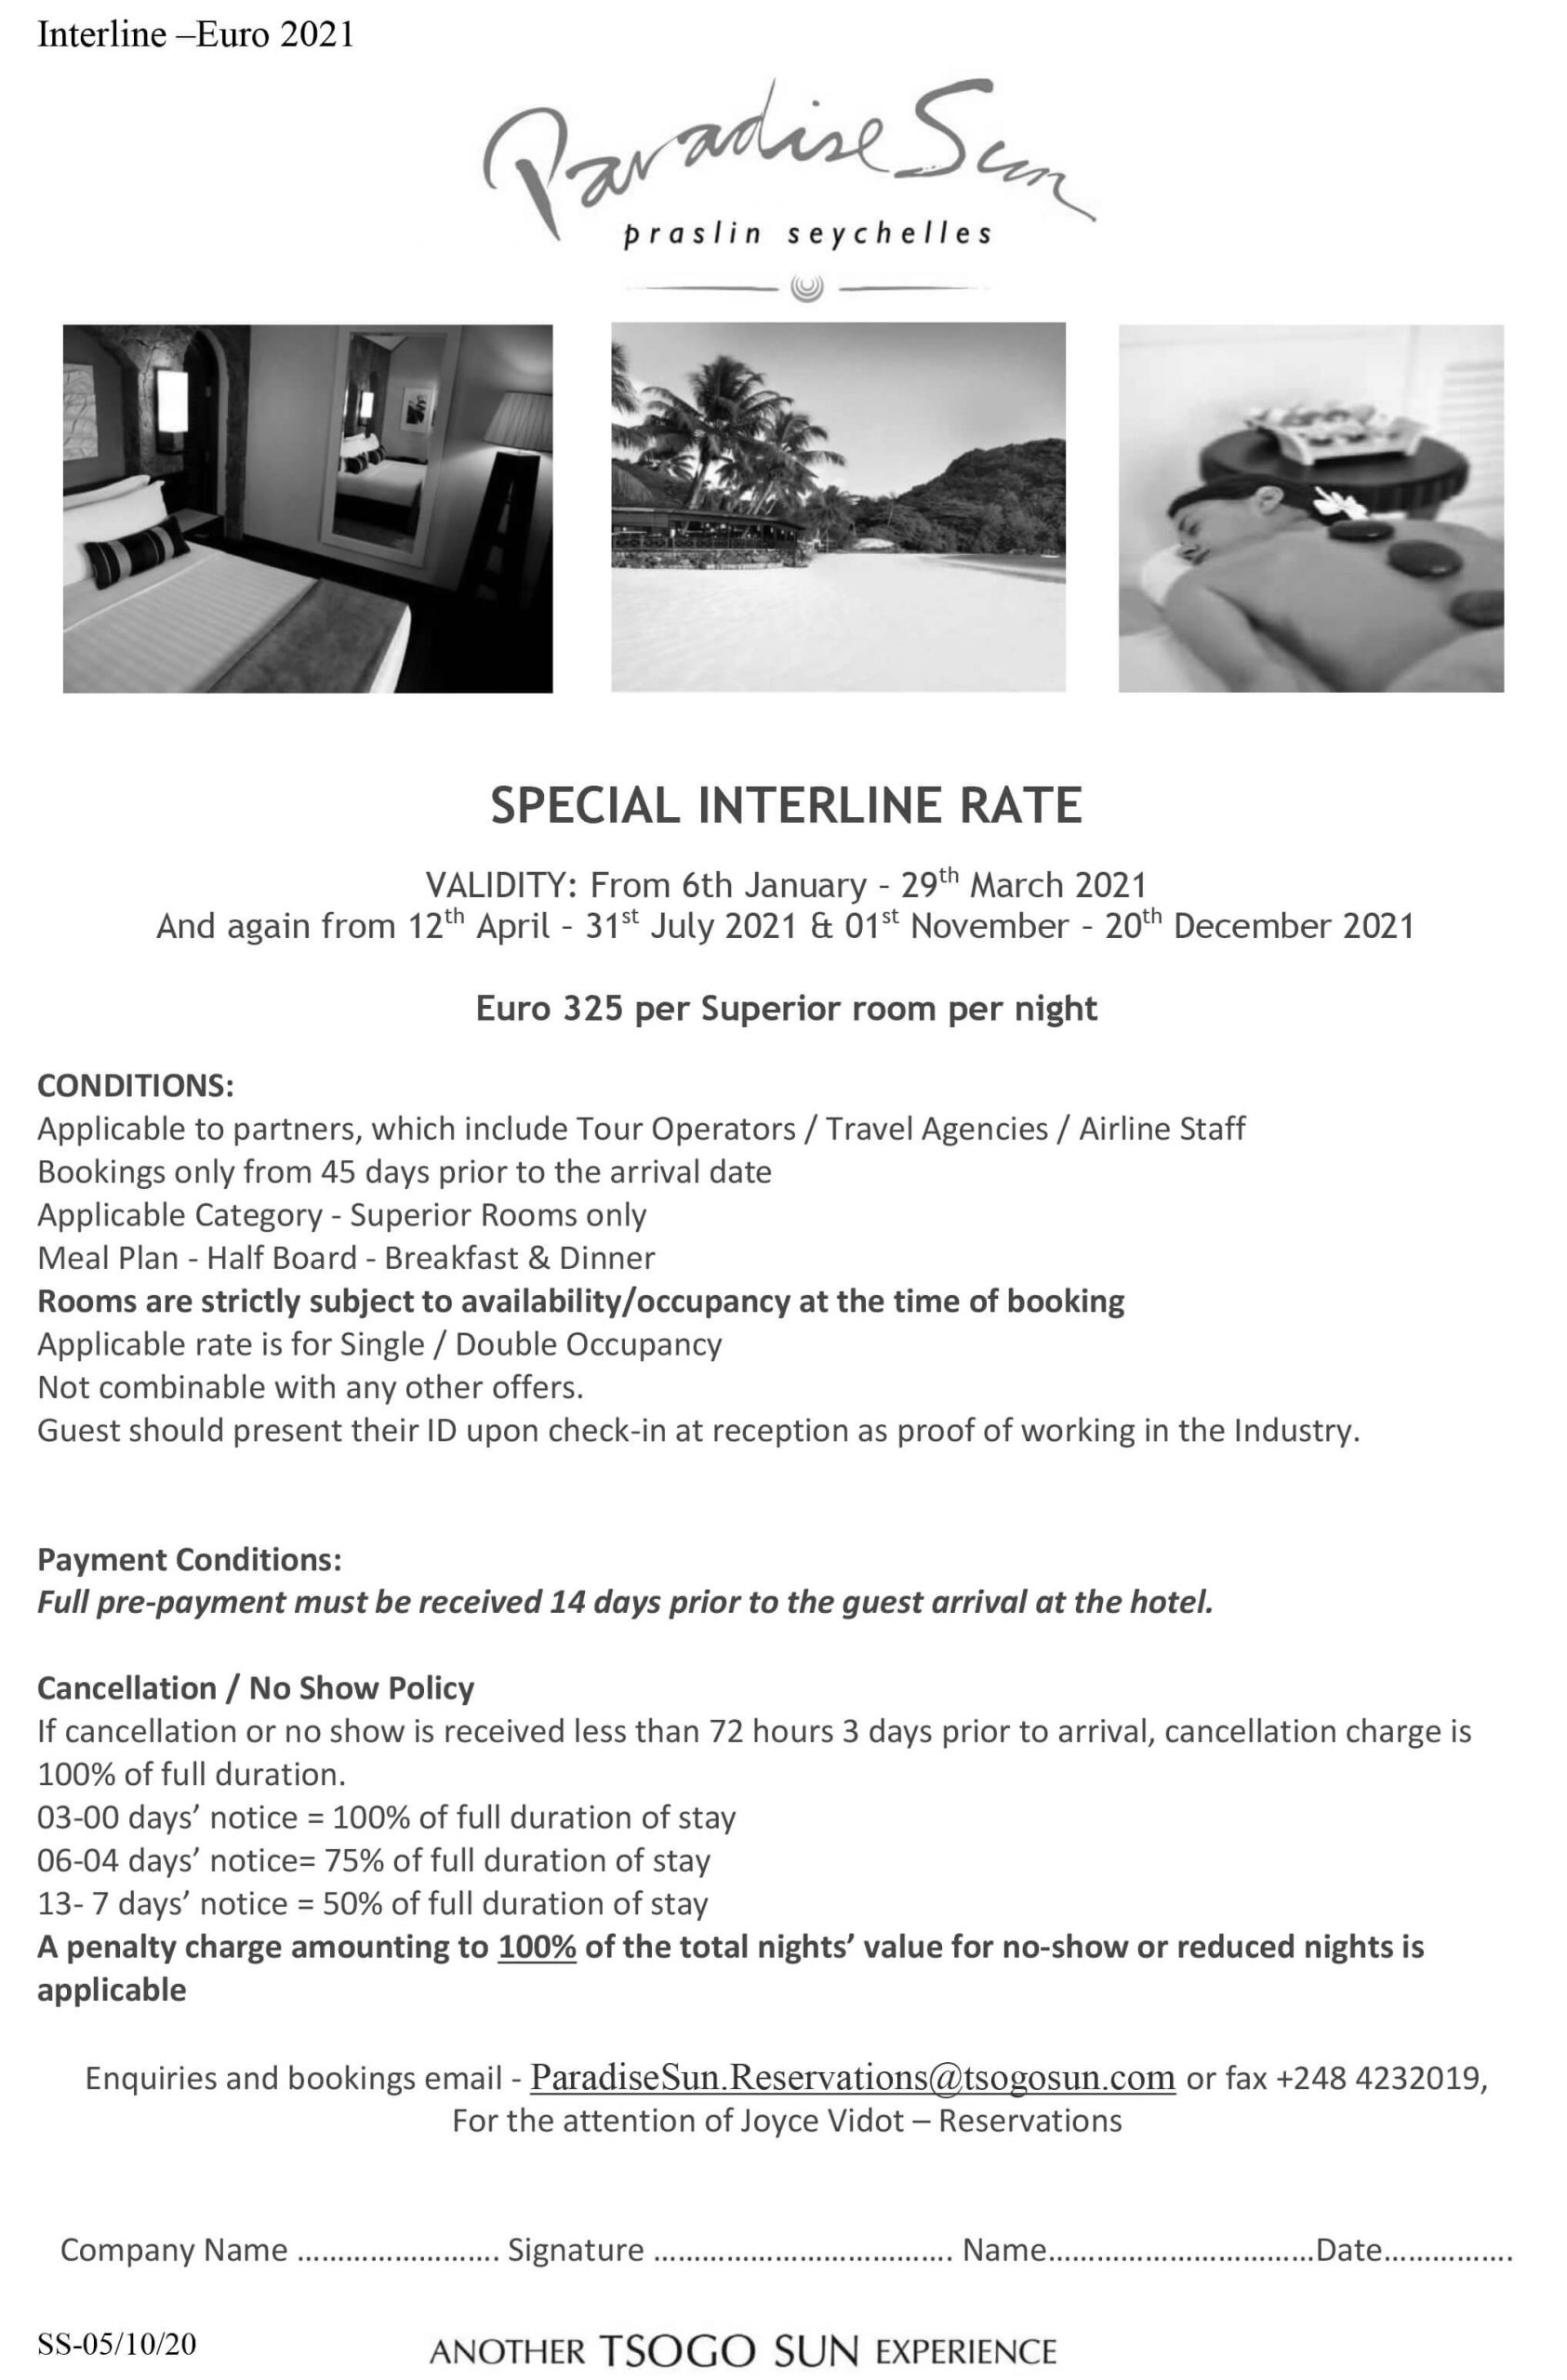 Interline Rate